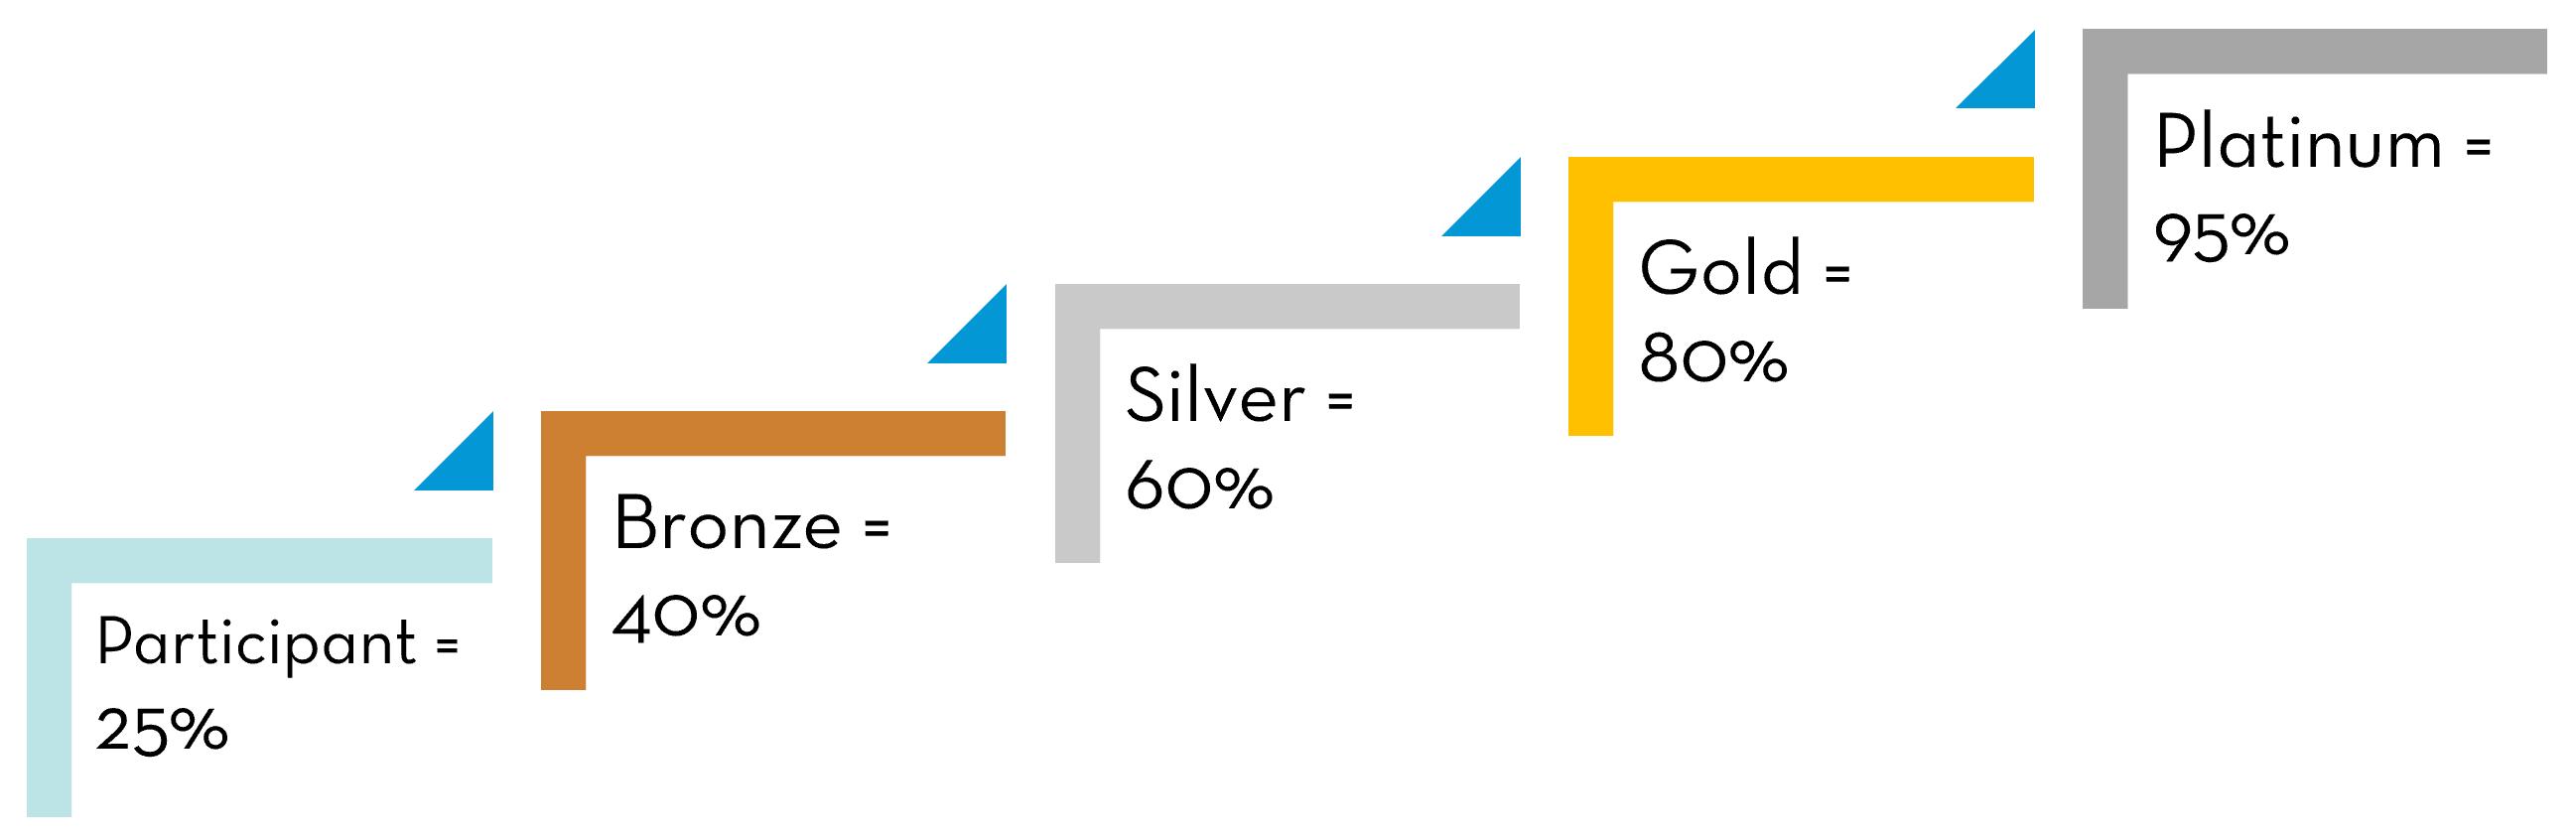 clean regattas, certification, levels, bronze, silver, gold, platinum